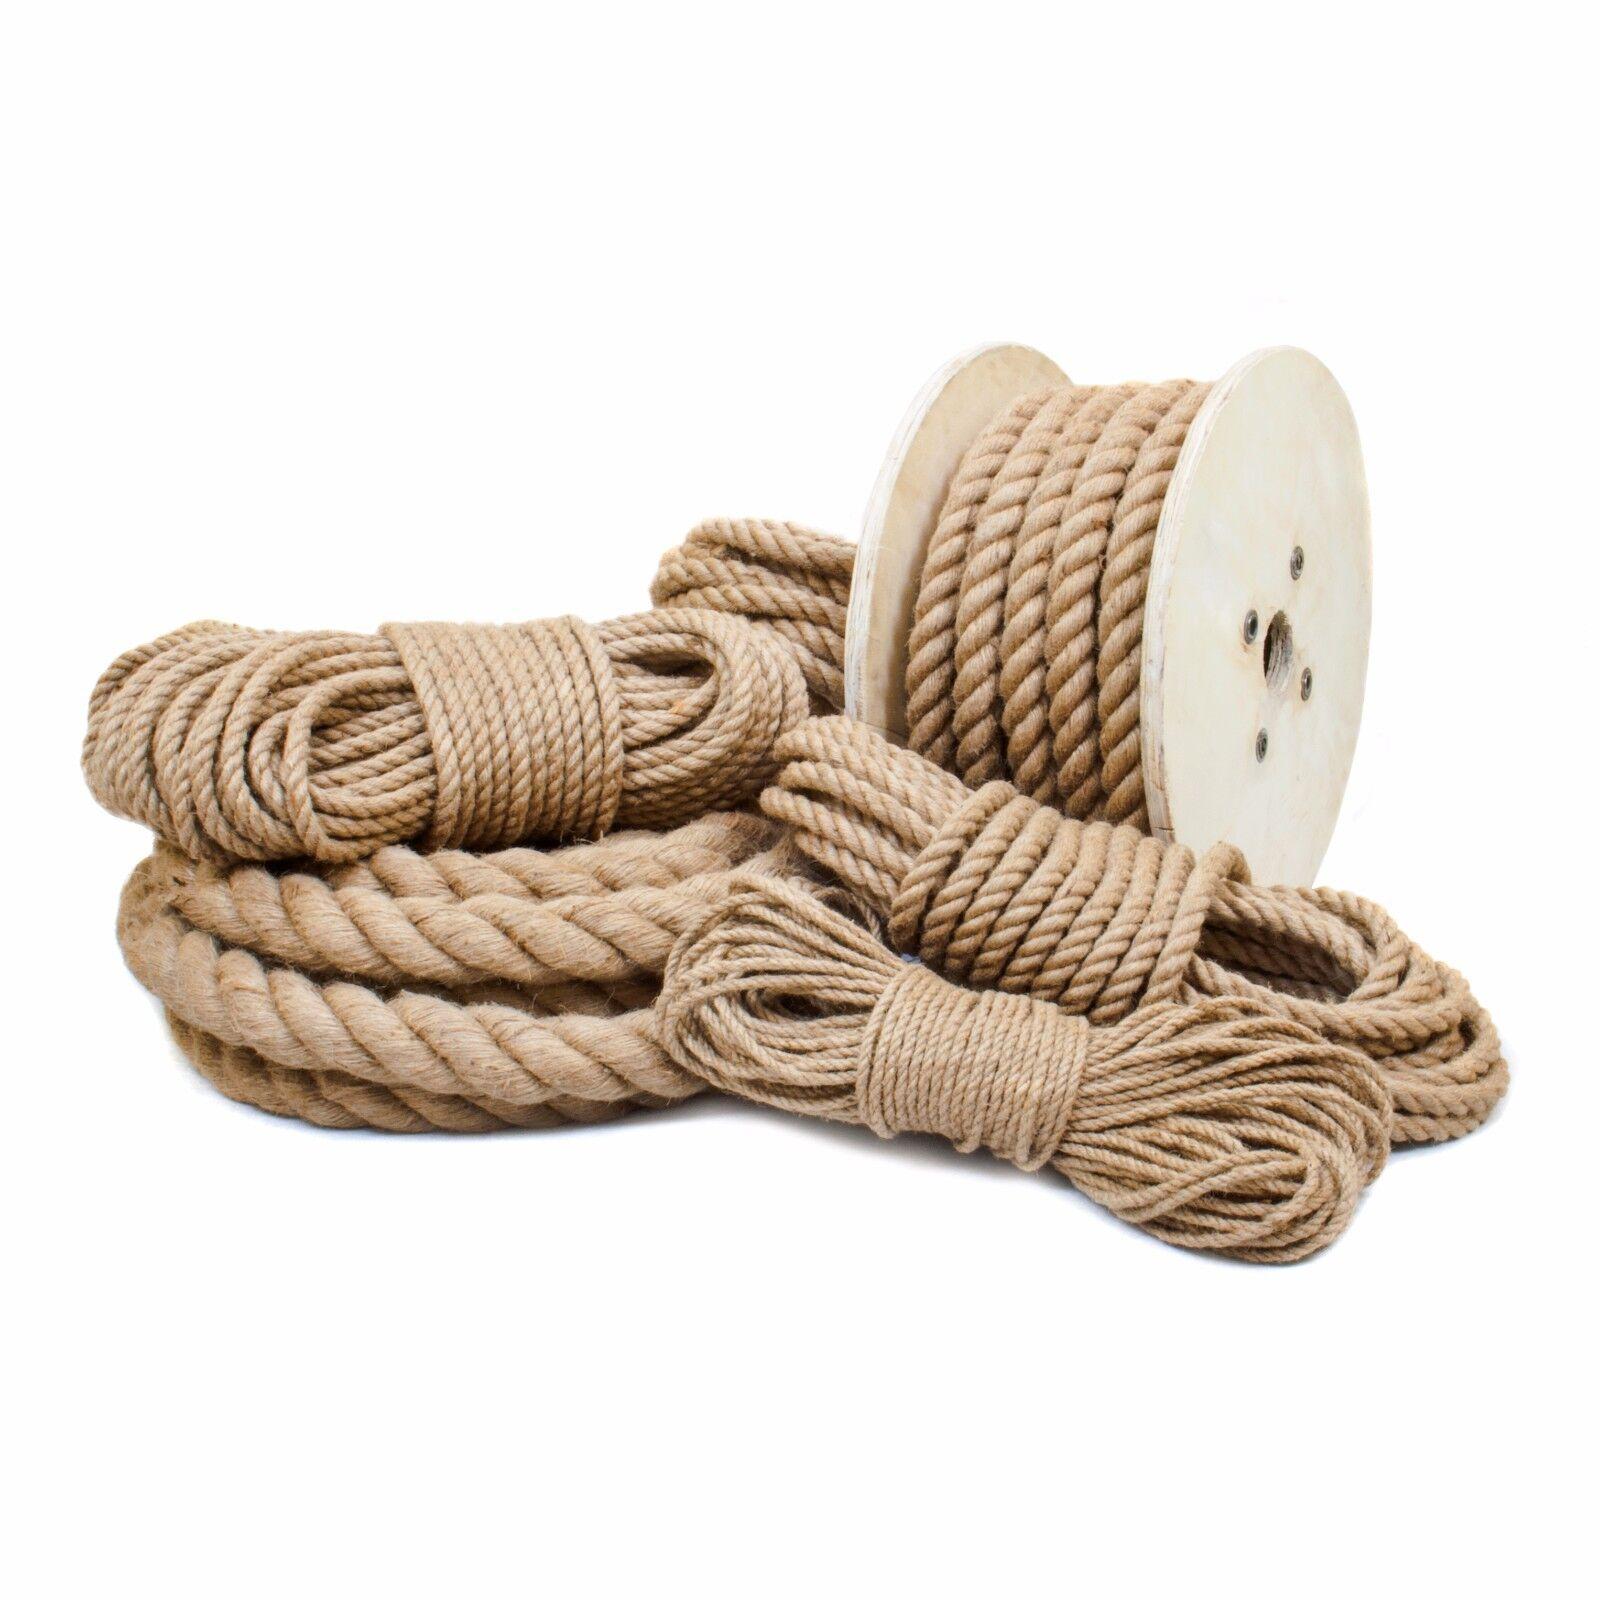 JUTESEIL 6mm - 60mm Hanfseil Jute Leine Tau Tauwerk Sport Deko Rope Seile Seil